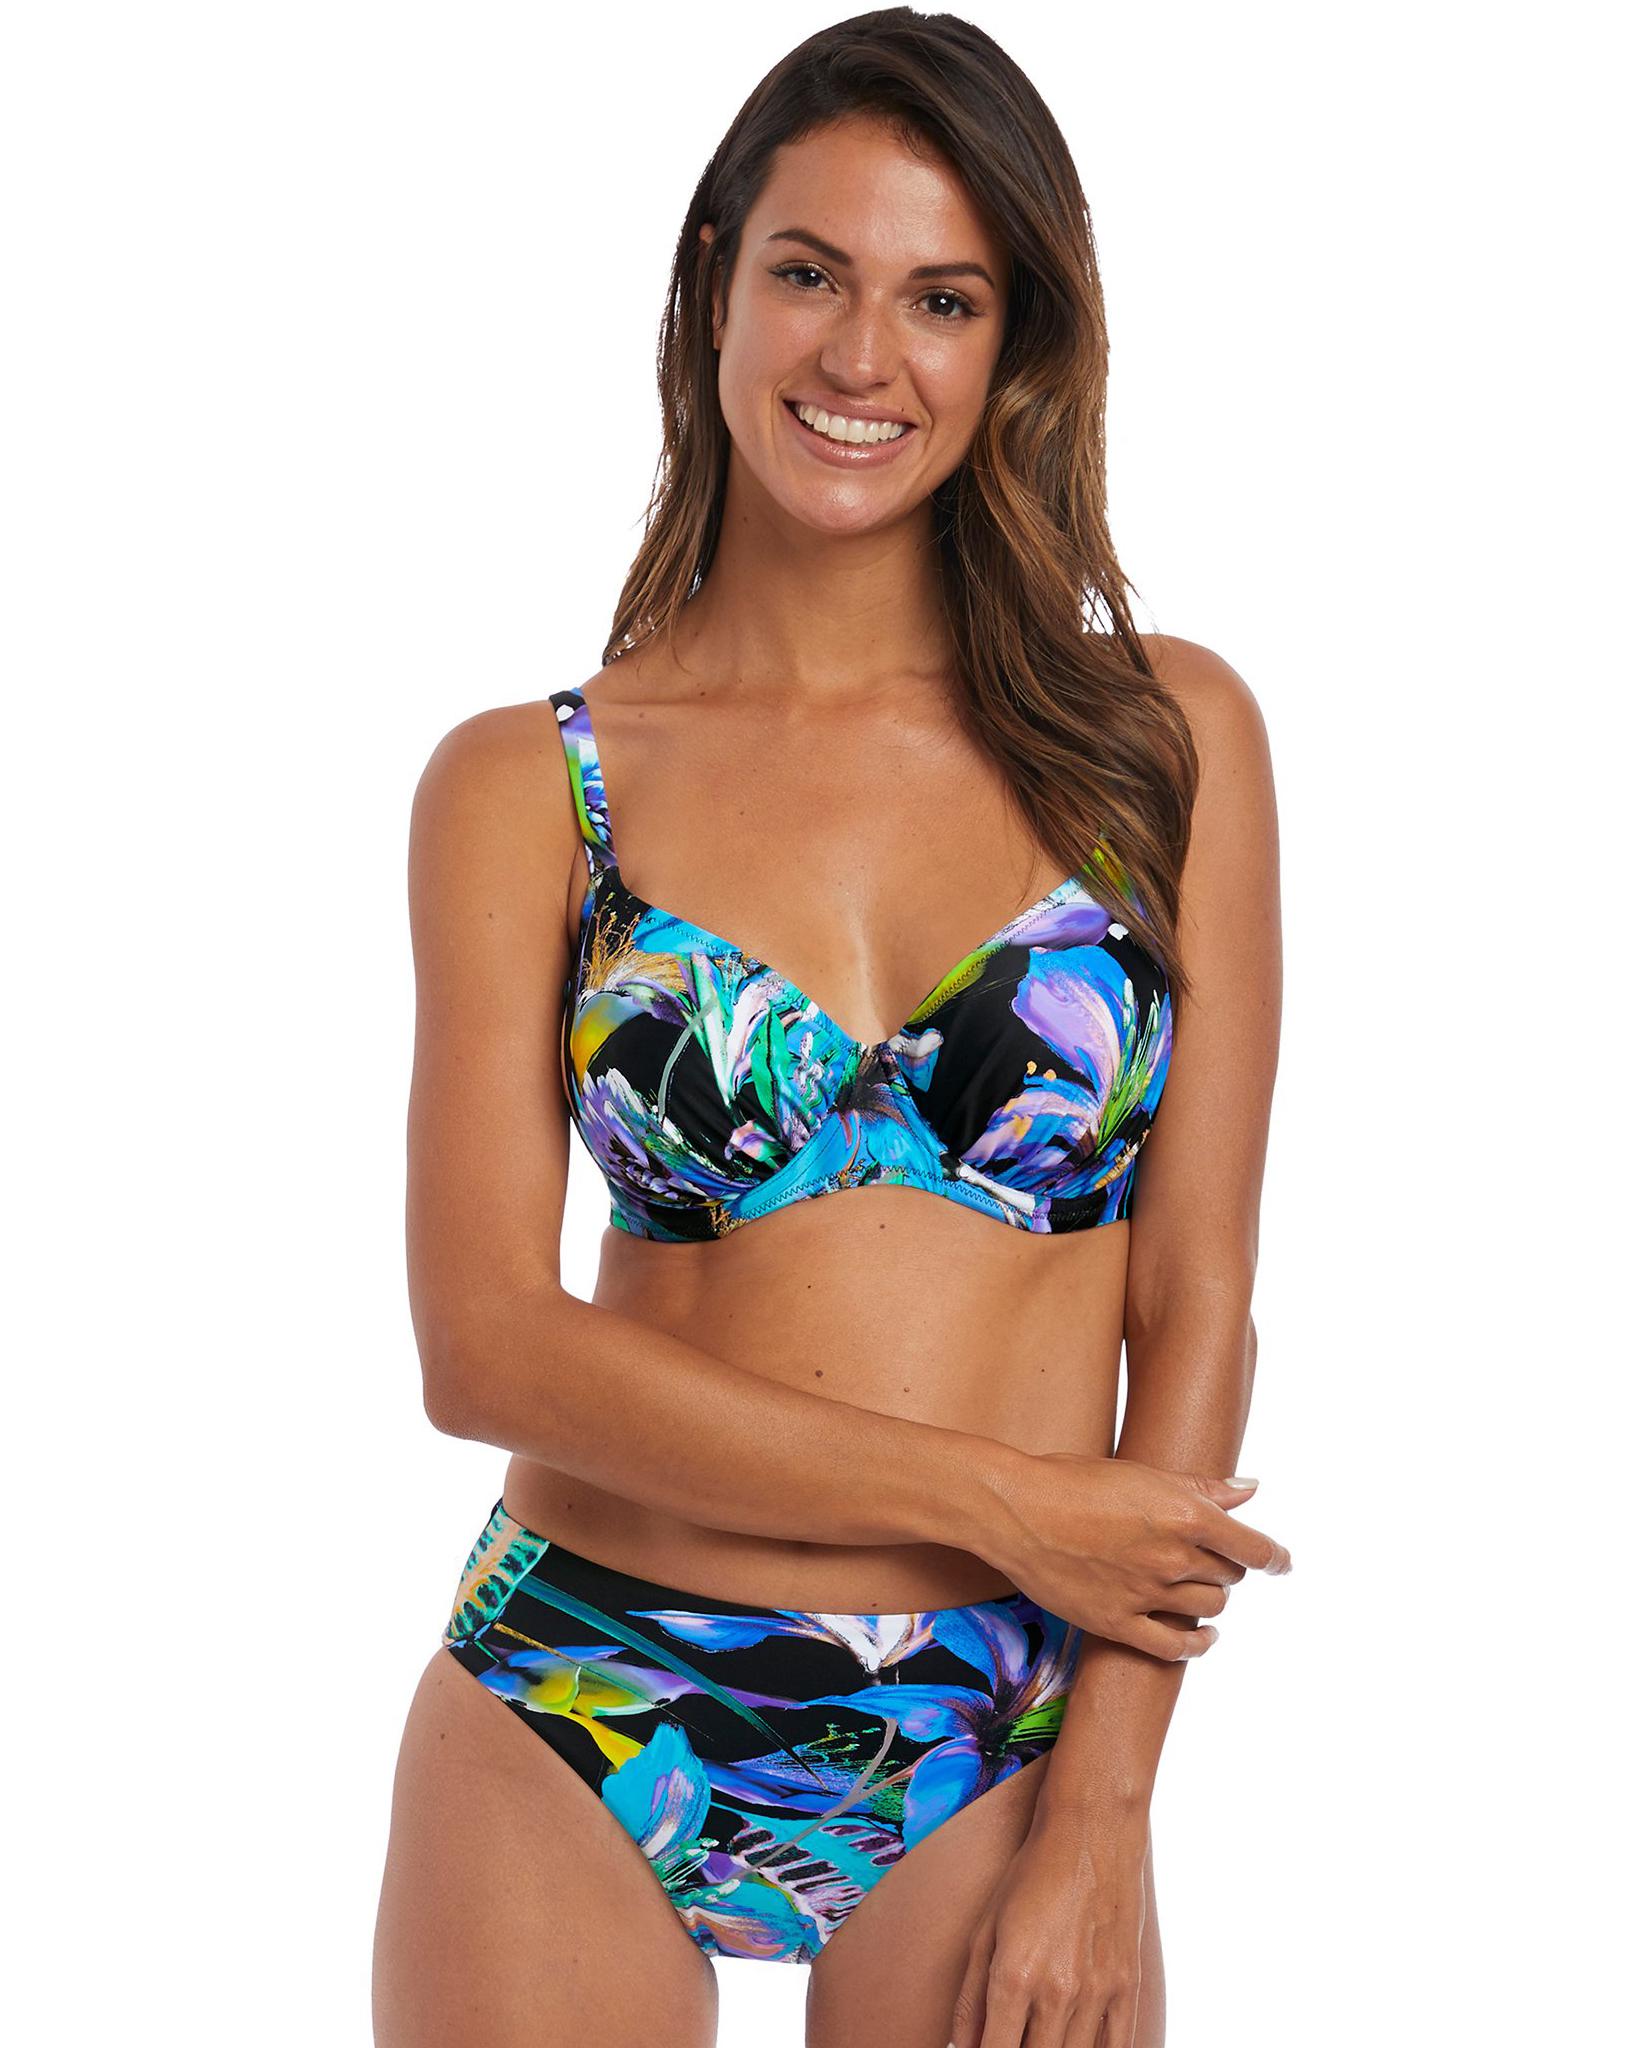 Верх купальника Fantasie Paradise Bay Full Cup Bikini Top (Aqua Multi) 75HH фото